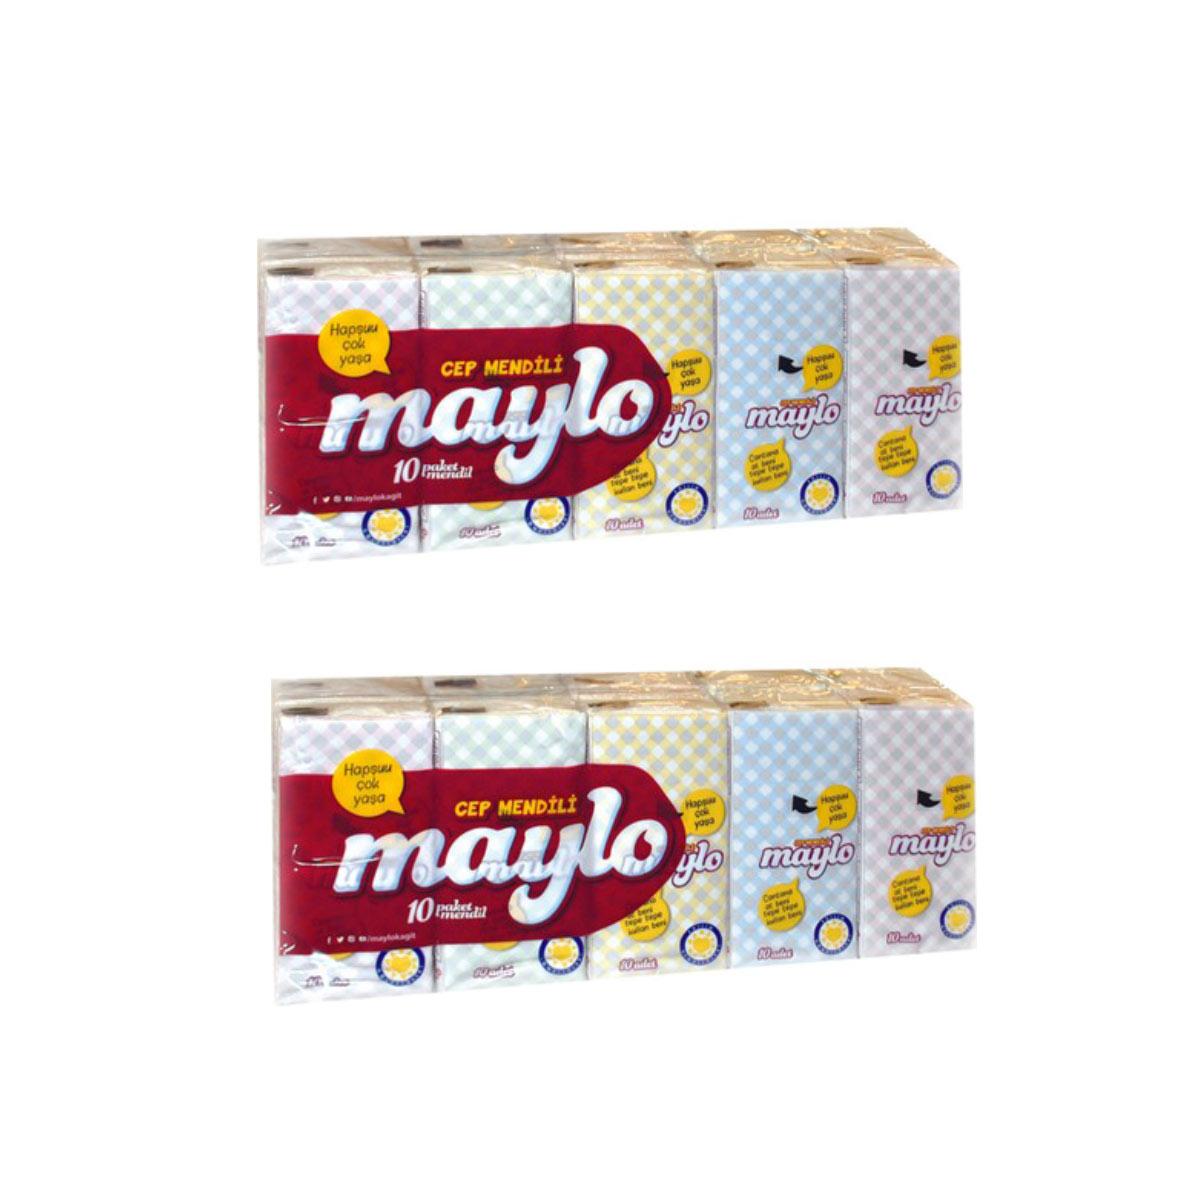 Maylo Cep Mendili 10 lu Paket X 2 Adet